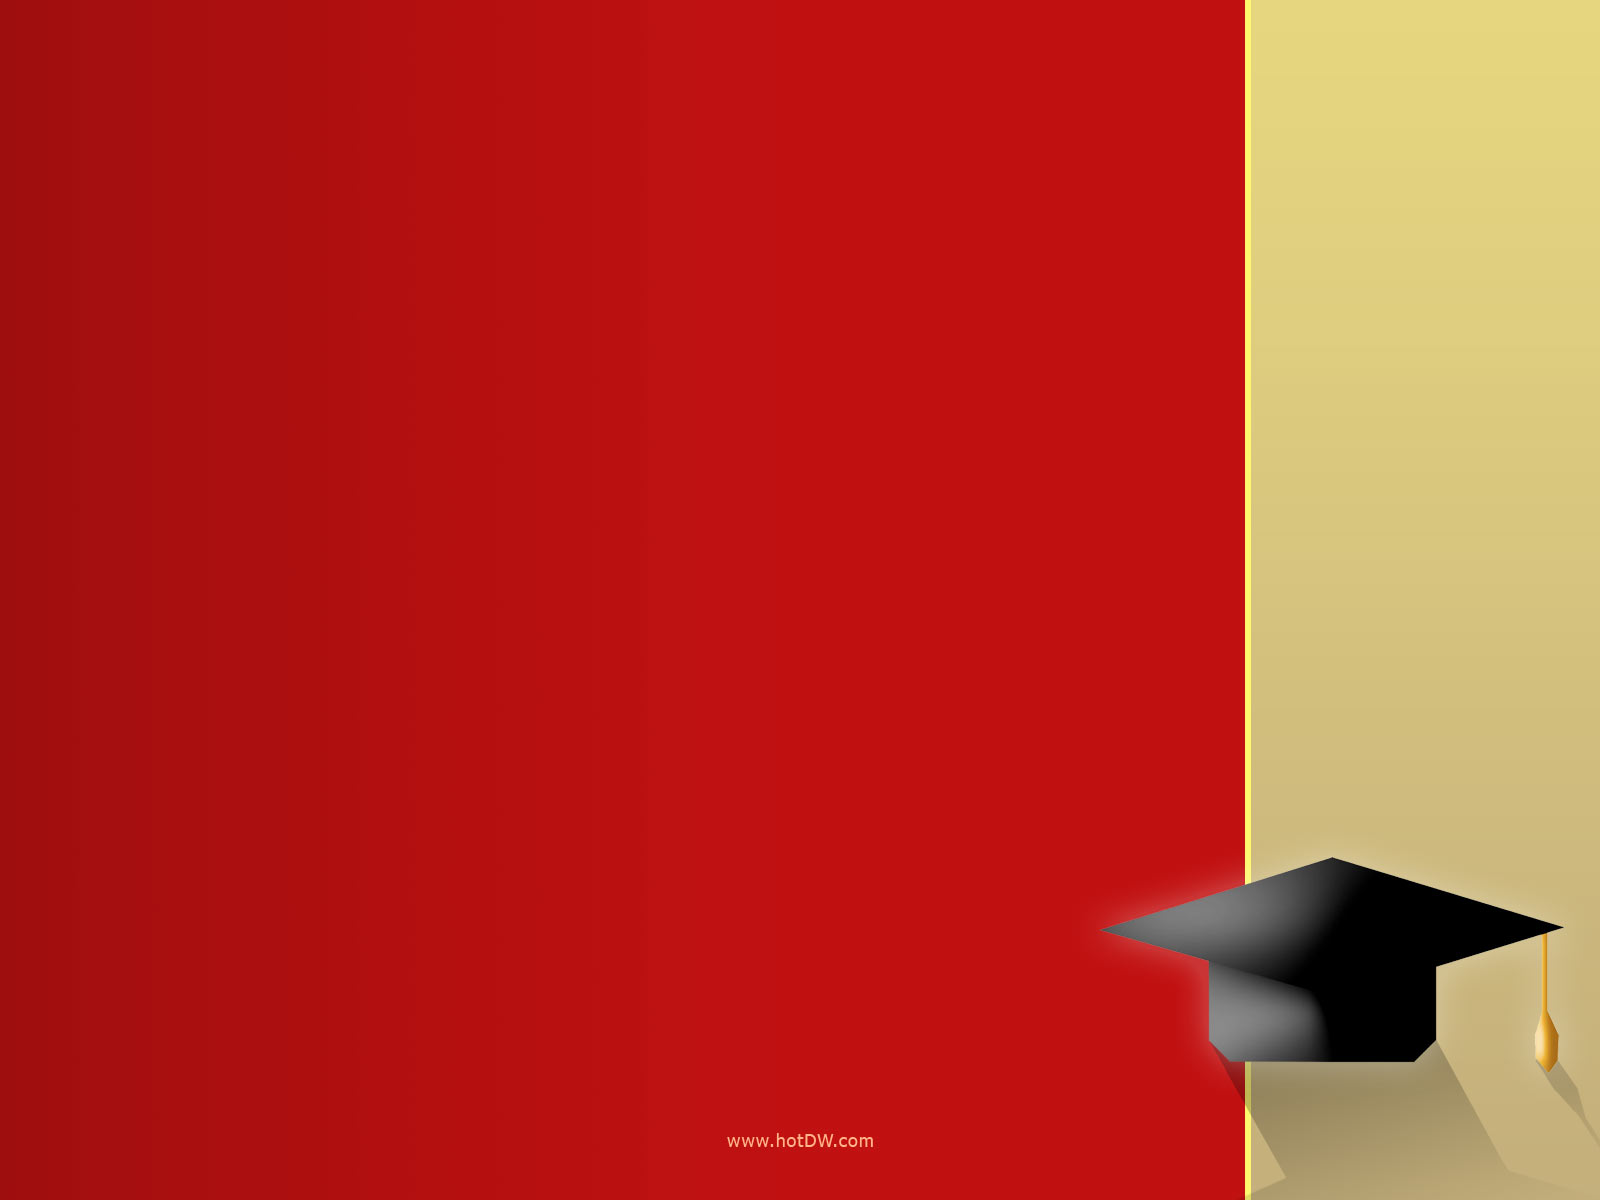 free graduation university backgrounds - photo #49